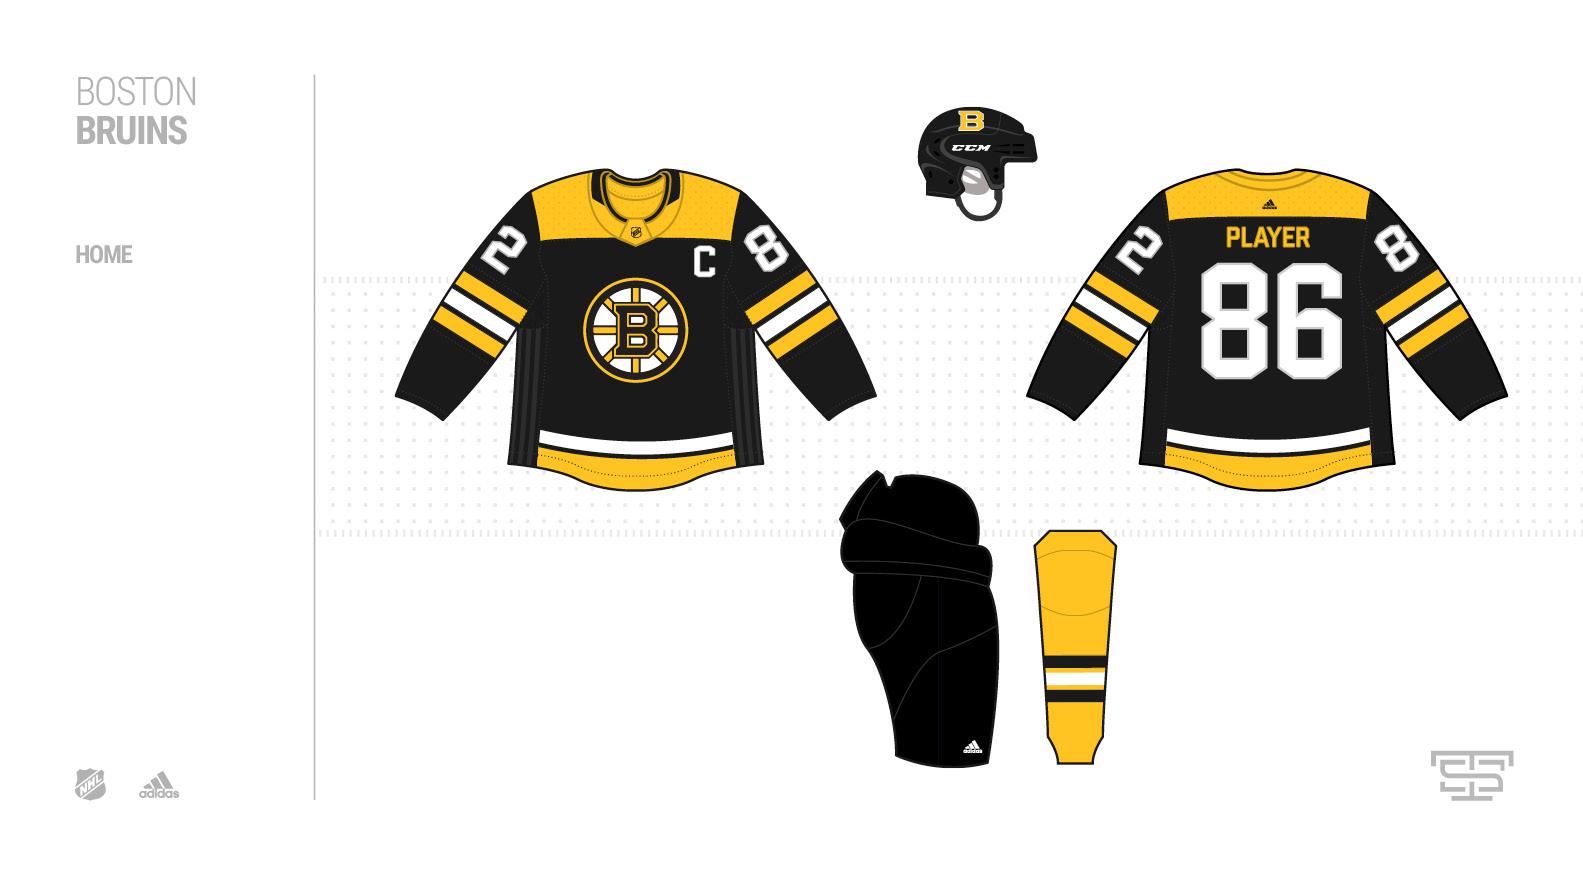 premium selection c8c7a c72e7 Adidas NHL Jersey Concepts - Concepts - Chris Creamer's ...